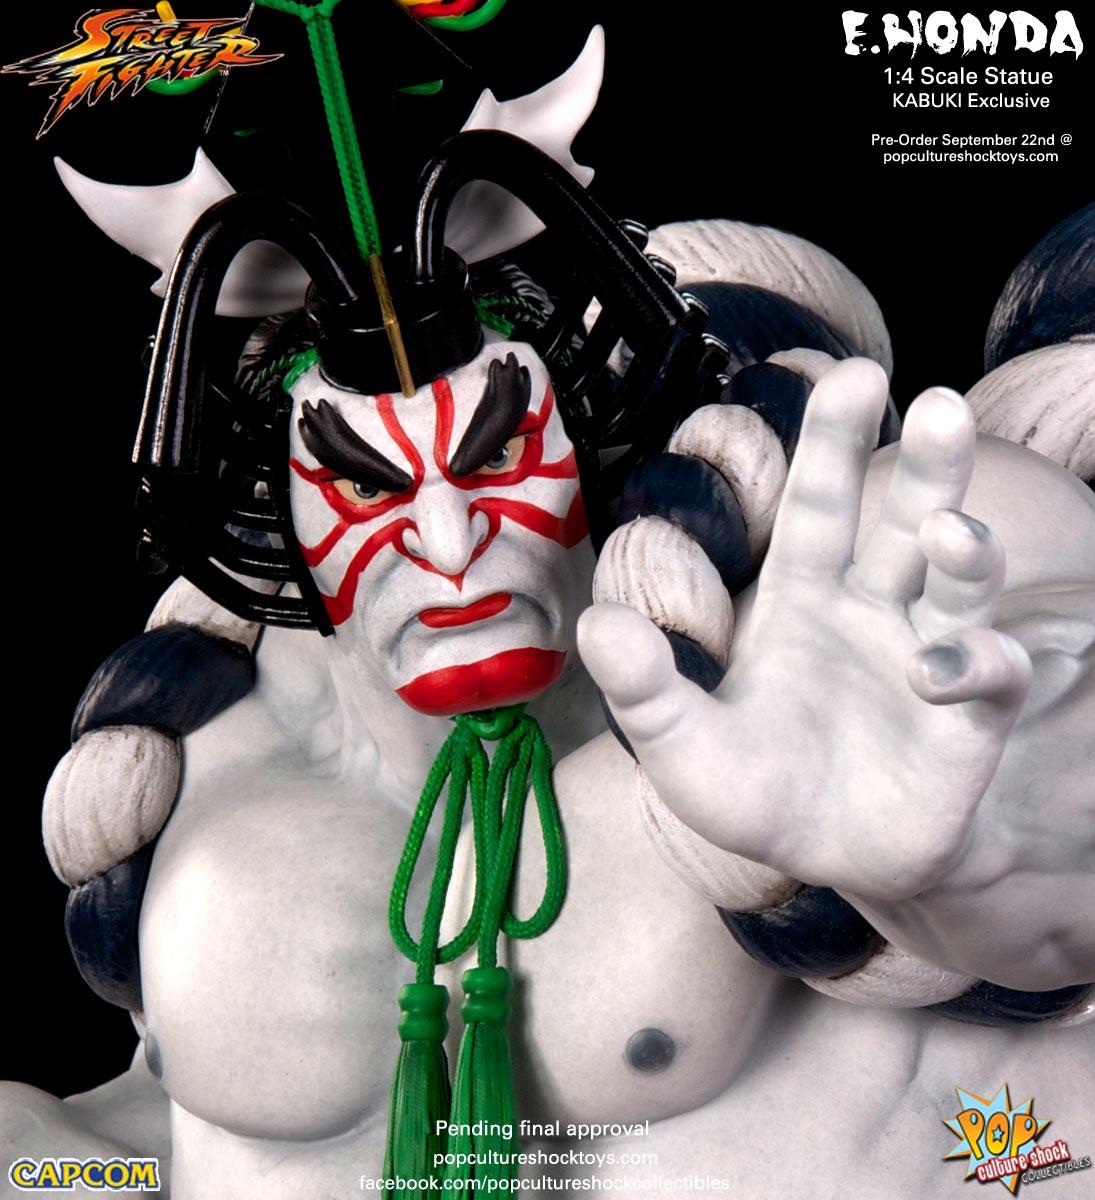 [Pop Culture Shock] Street Fighter: E. Honda 1/4 Statue - Página 3 Street-Fighter-E.-Honda-Kabuki-Statue-018